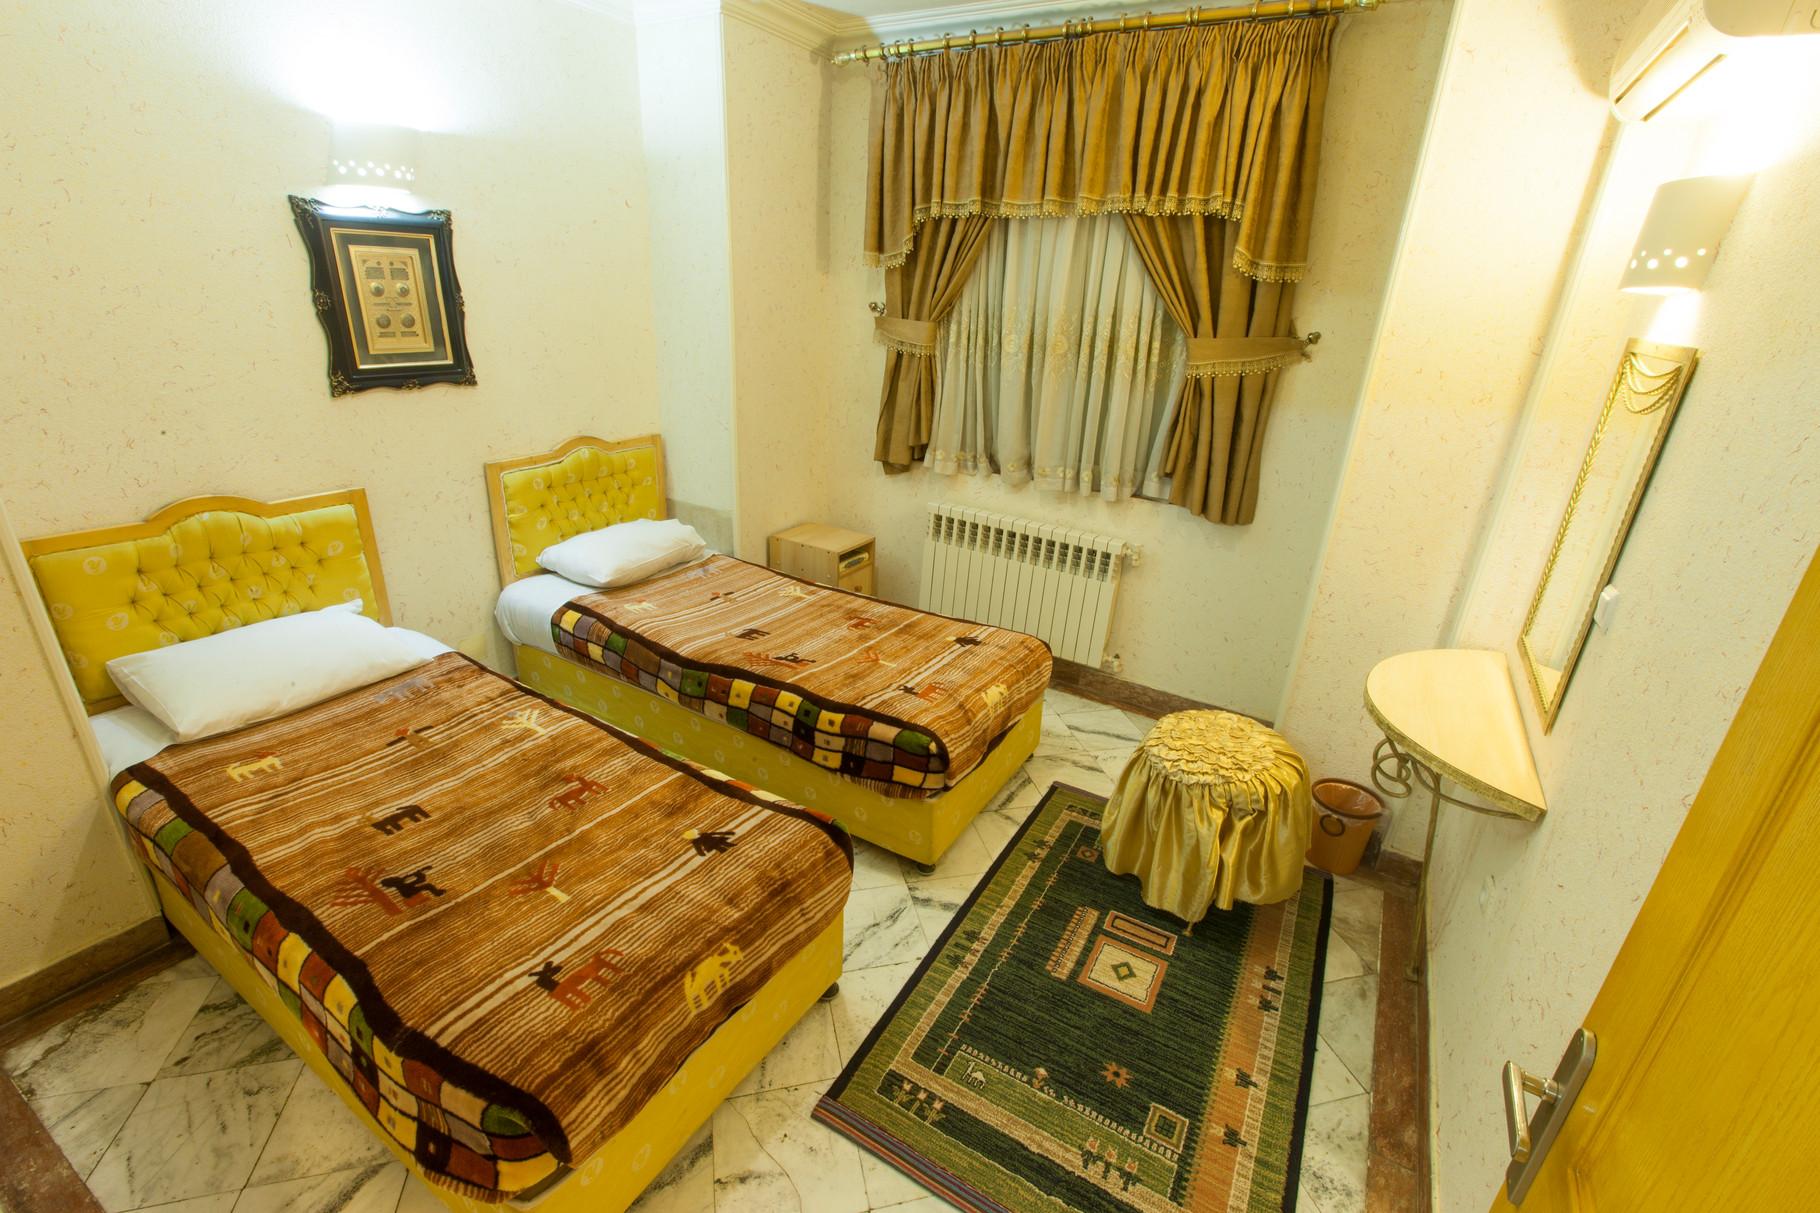 Hotelapartment Melal in Mashhad